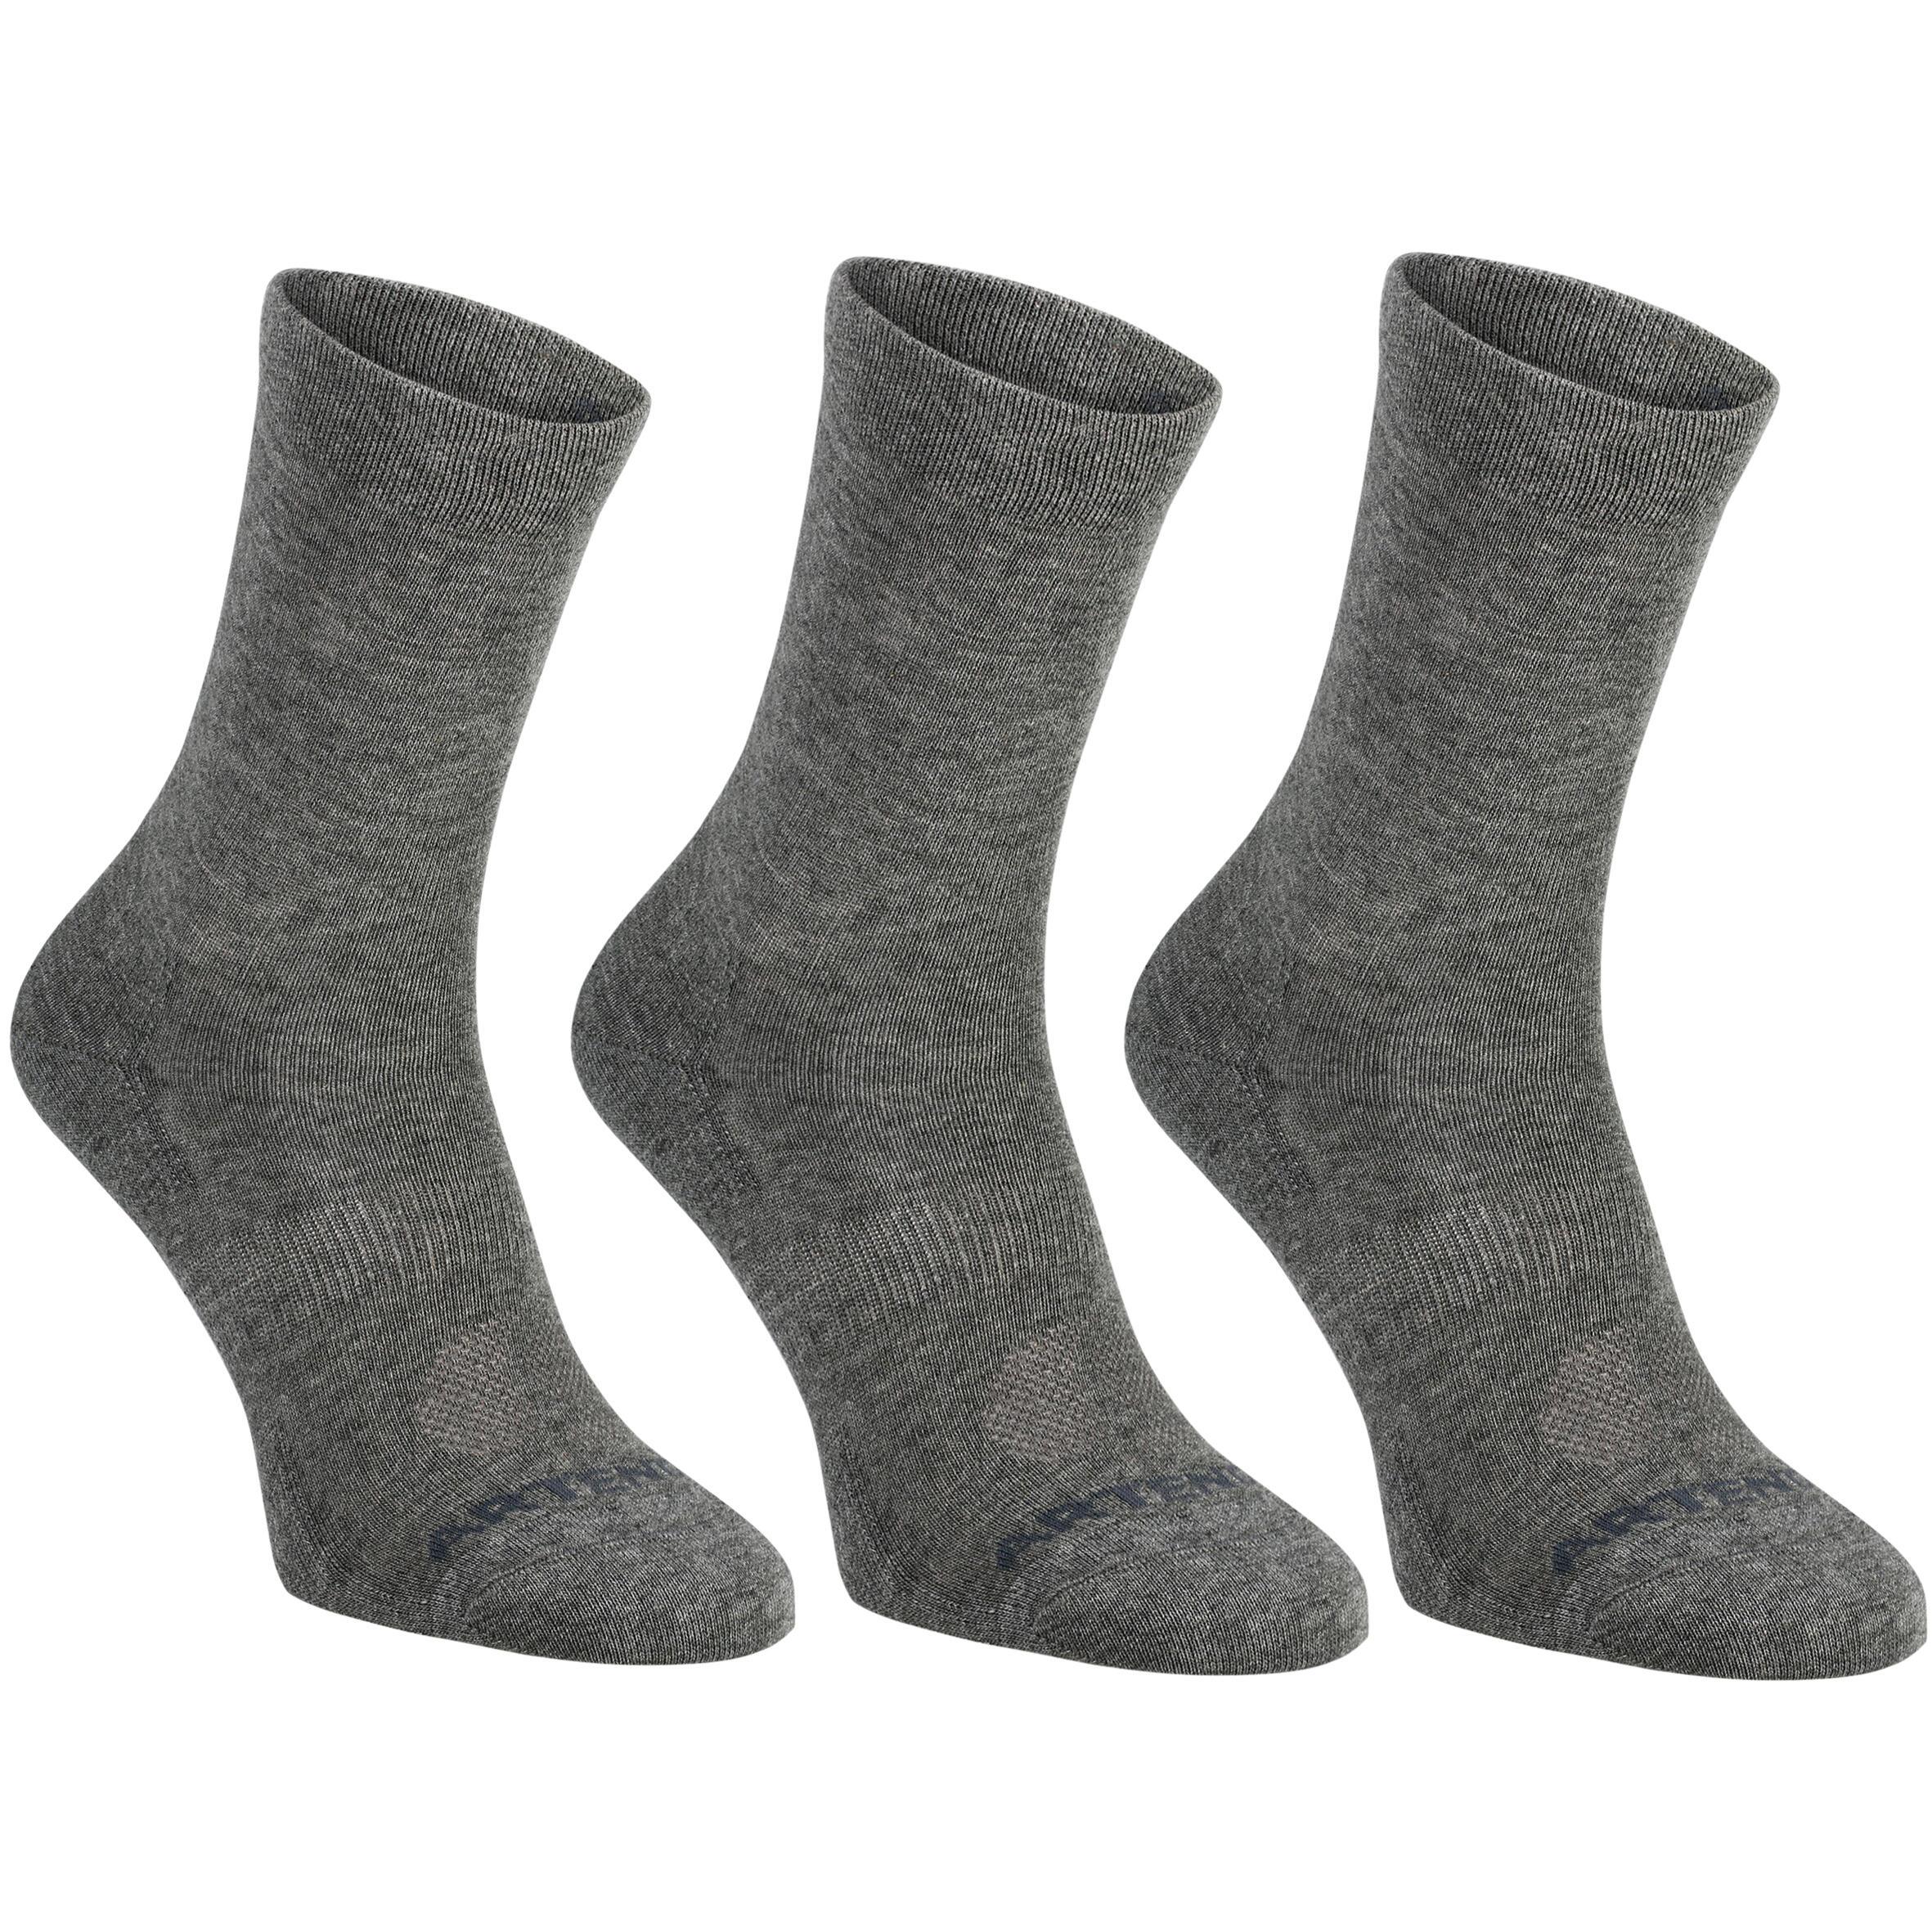 RS 160 High Sport Socks 3-Pack - Dark Grey